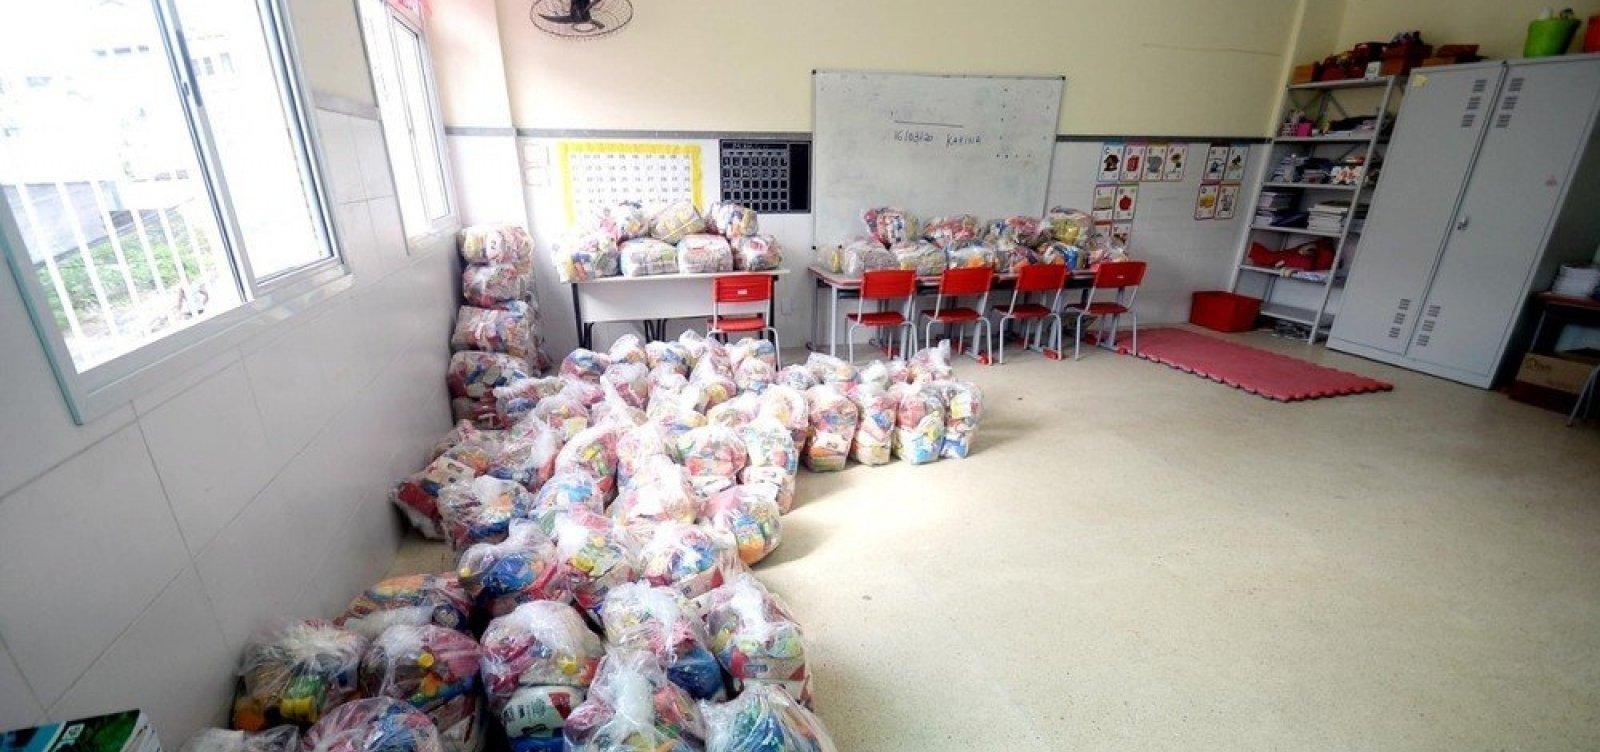 [Prefeitura de Salvador inicia nova etapa de entrega de cestas básicas para alunos nesta segunda]